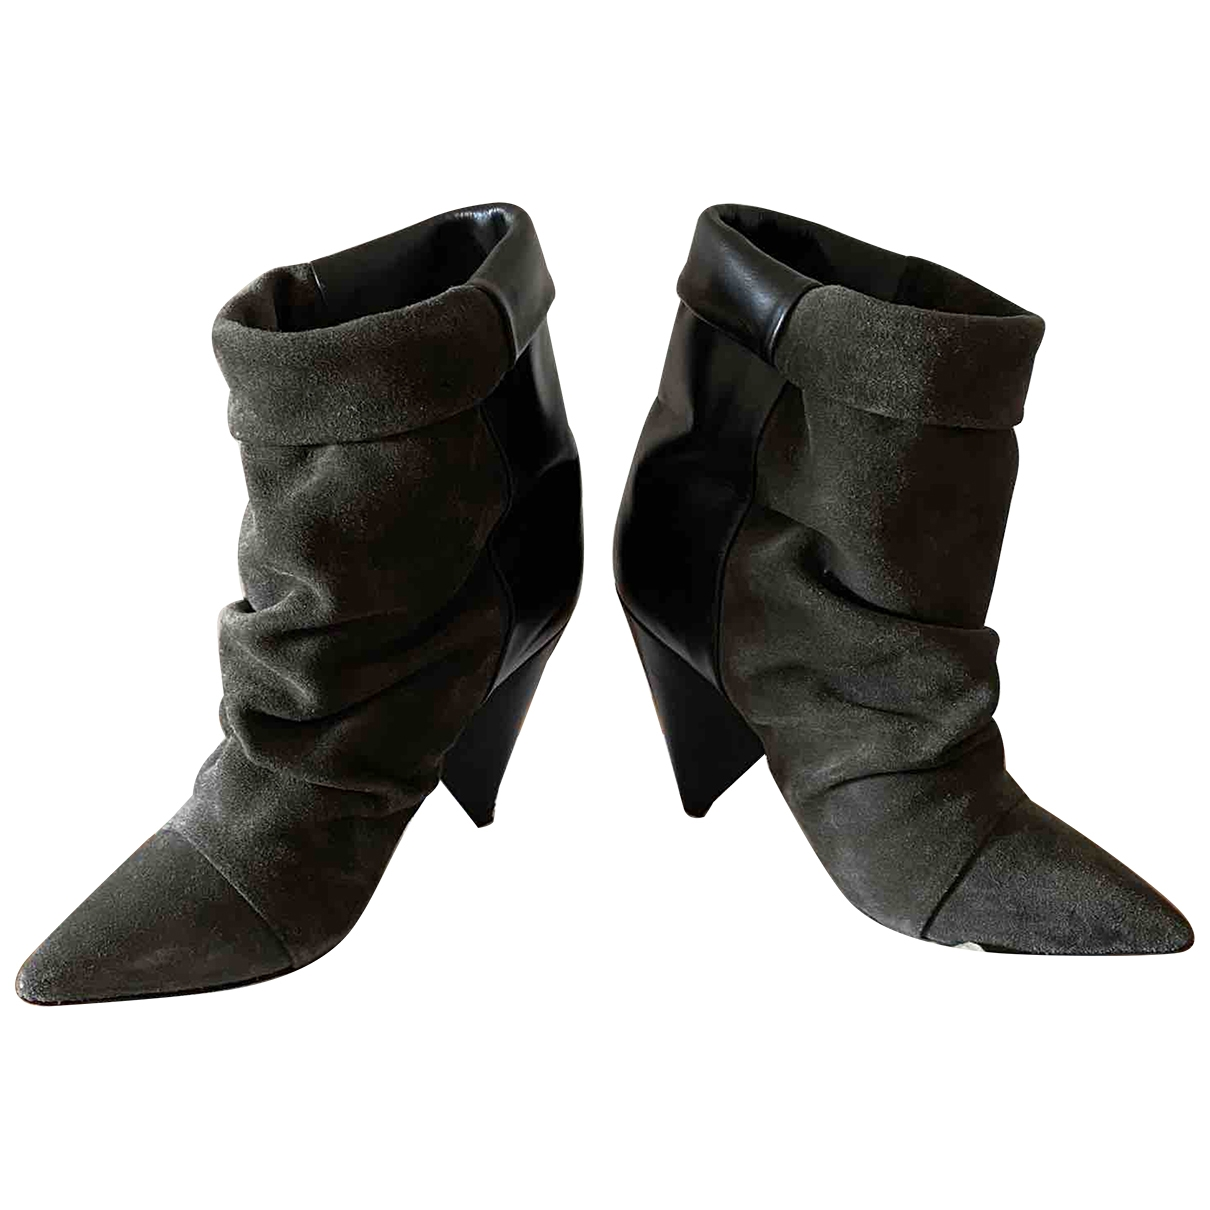 Isabel Marant Luliana Khaki Suede Ankle boots for Women 36 EU